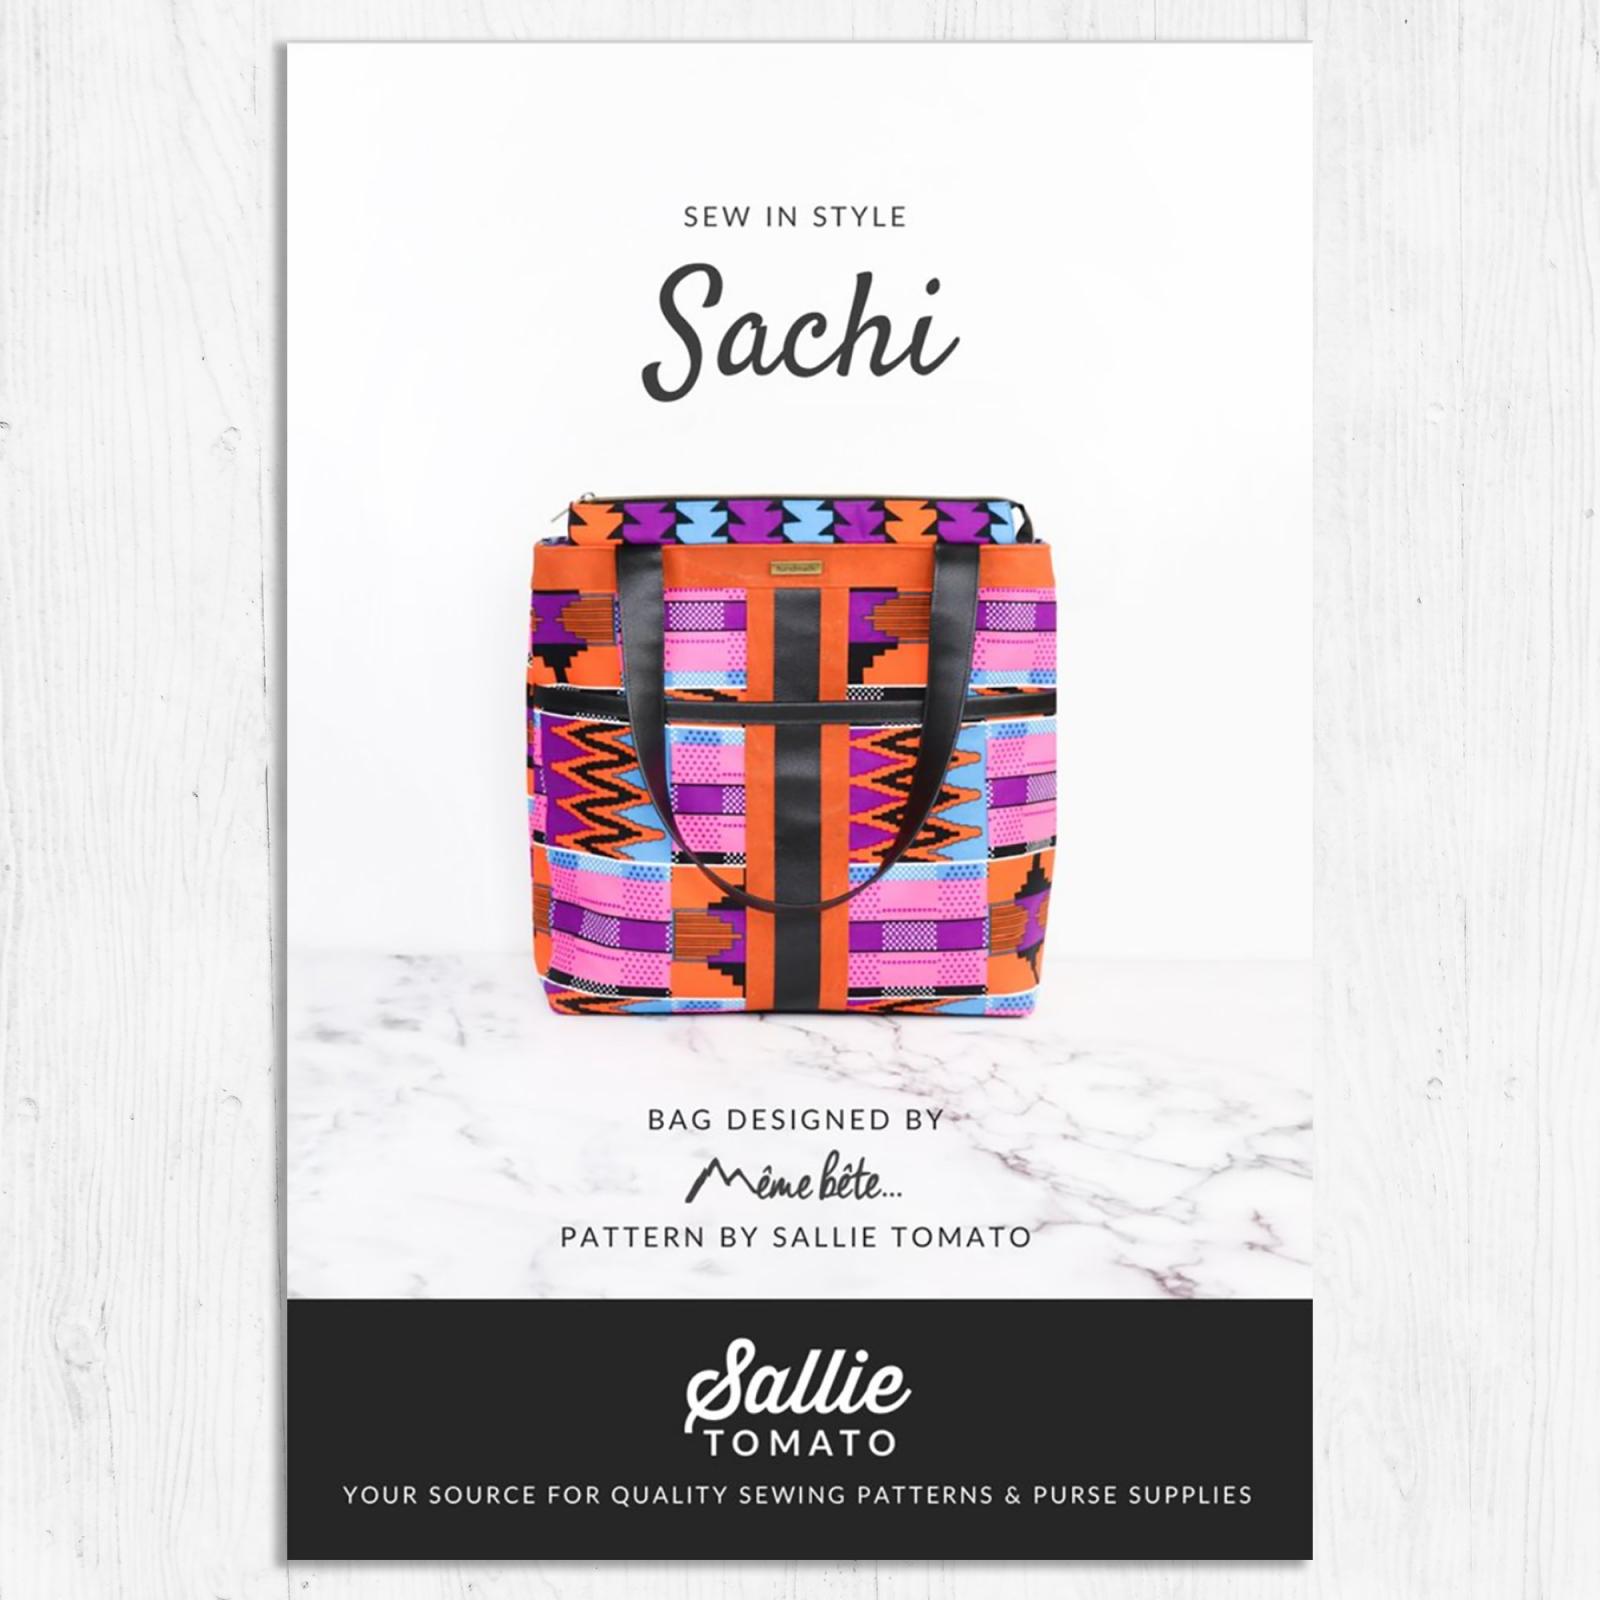 Sallie Tomato- Sachi Tote Pattern